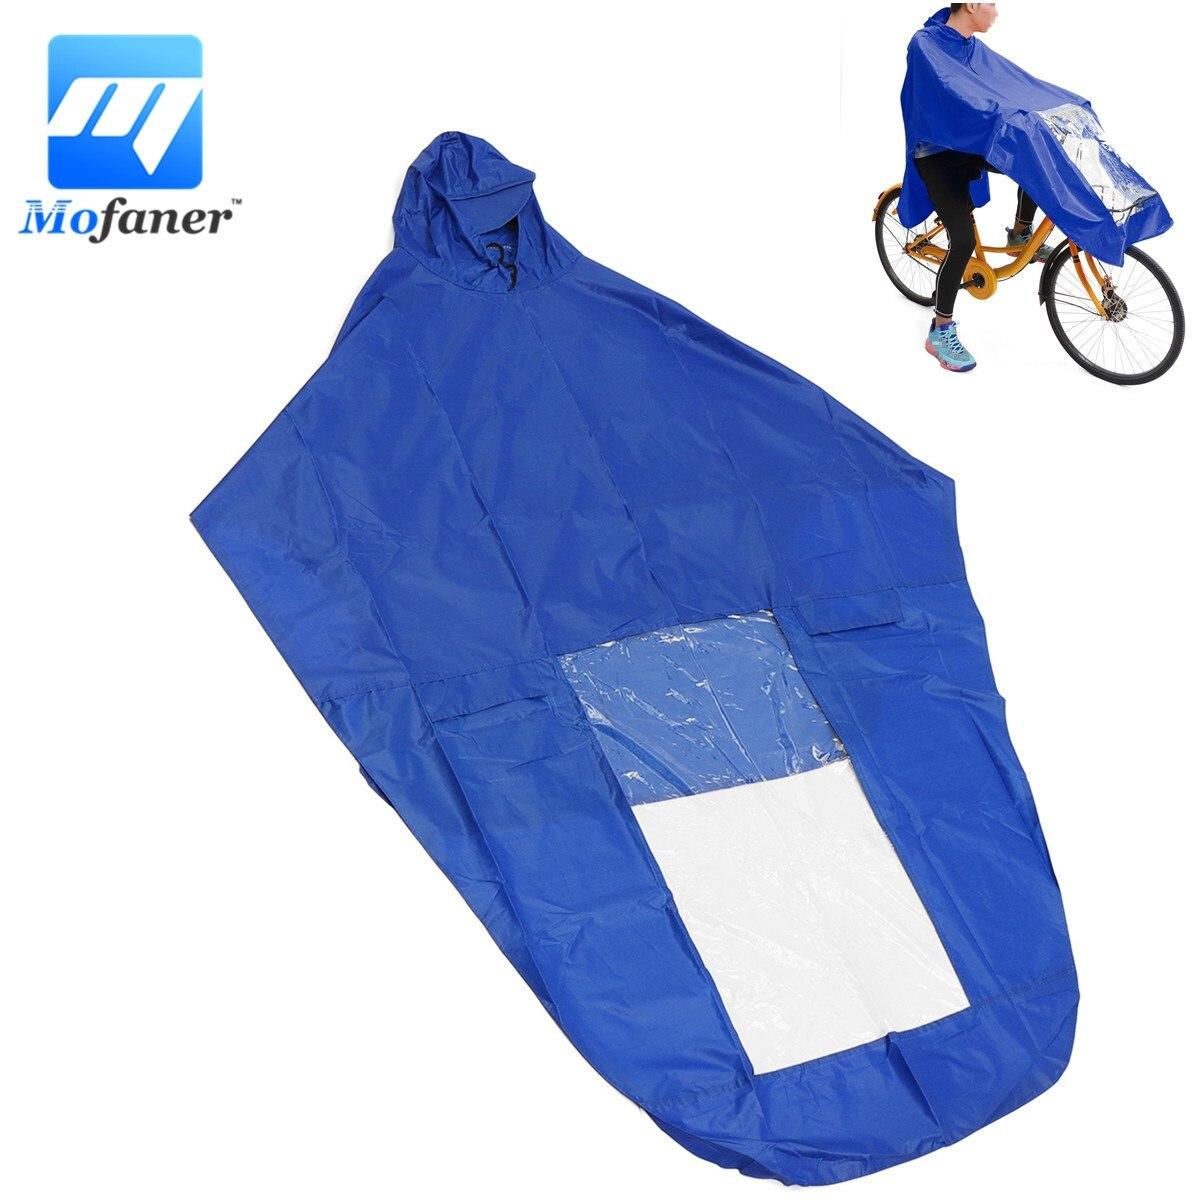 Mofaner Waterproof Motorcycle Scooter Raincoat Cover Windproof PVC Motorbike Bike Rider Rain Coat Covers Bule Red